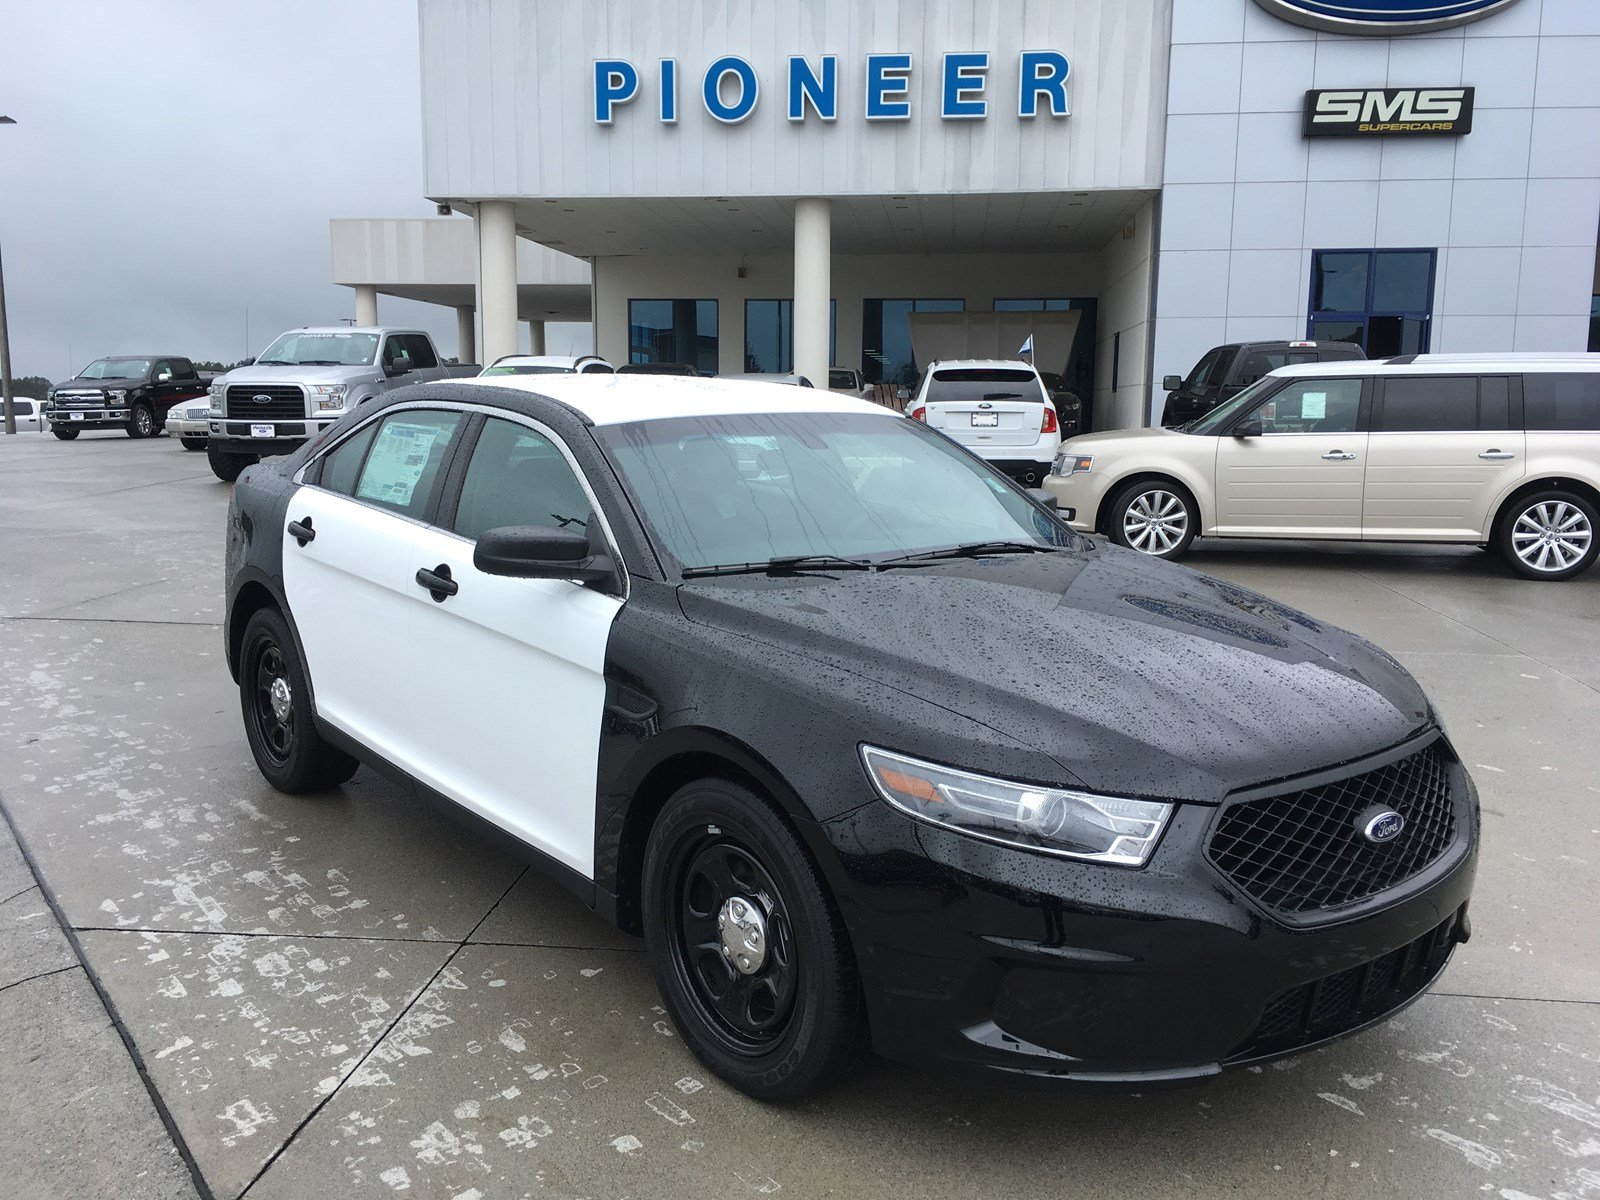 2016 Ford Sedan Police Interceptor Sedan